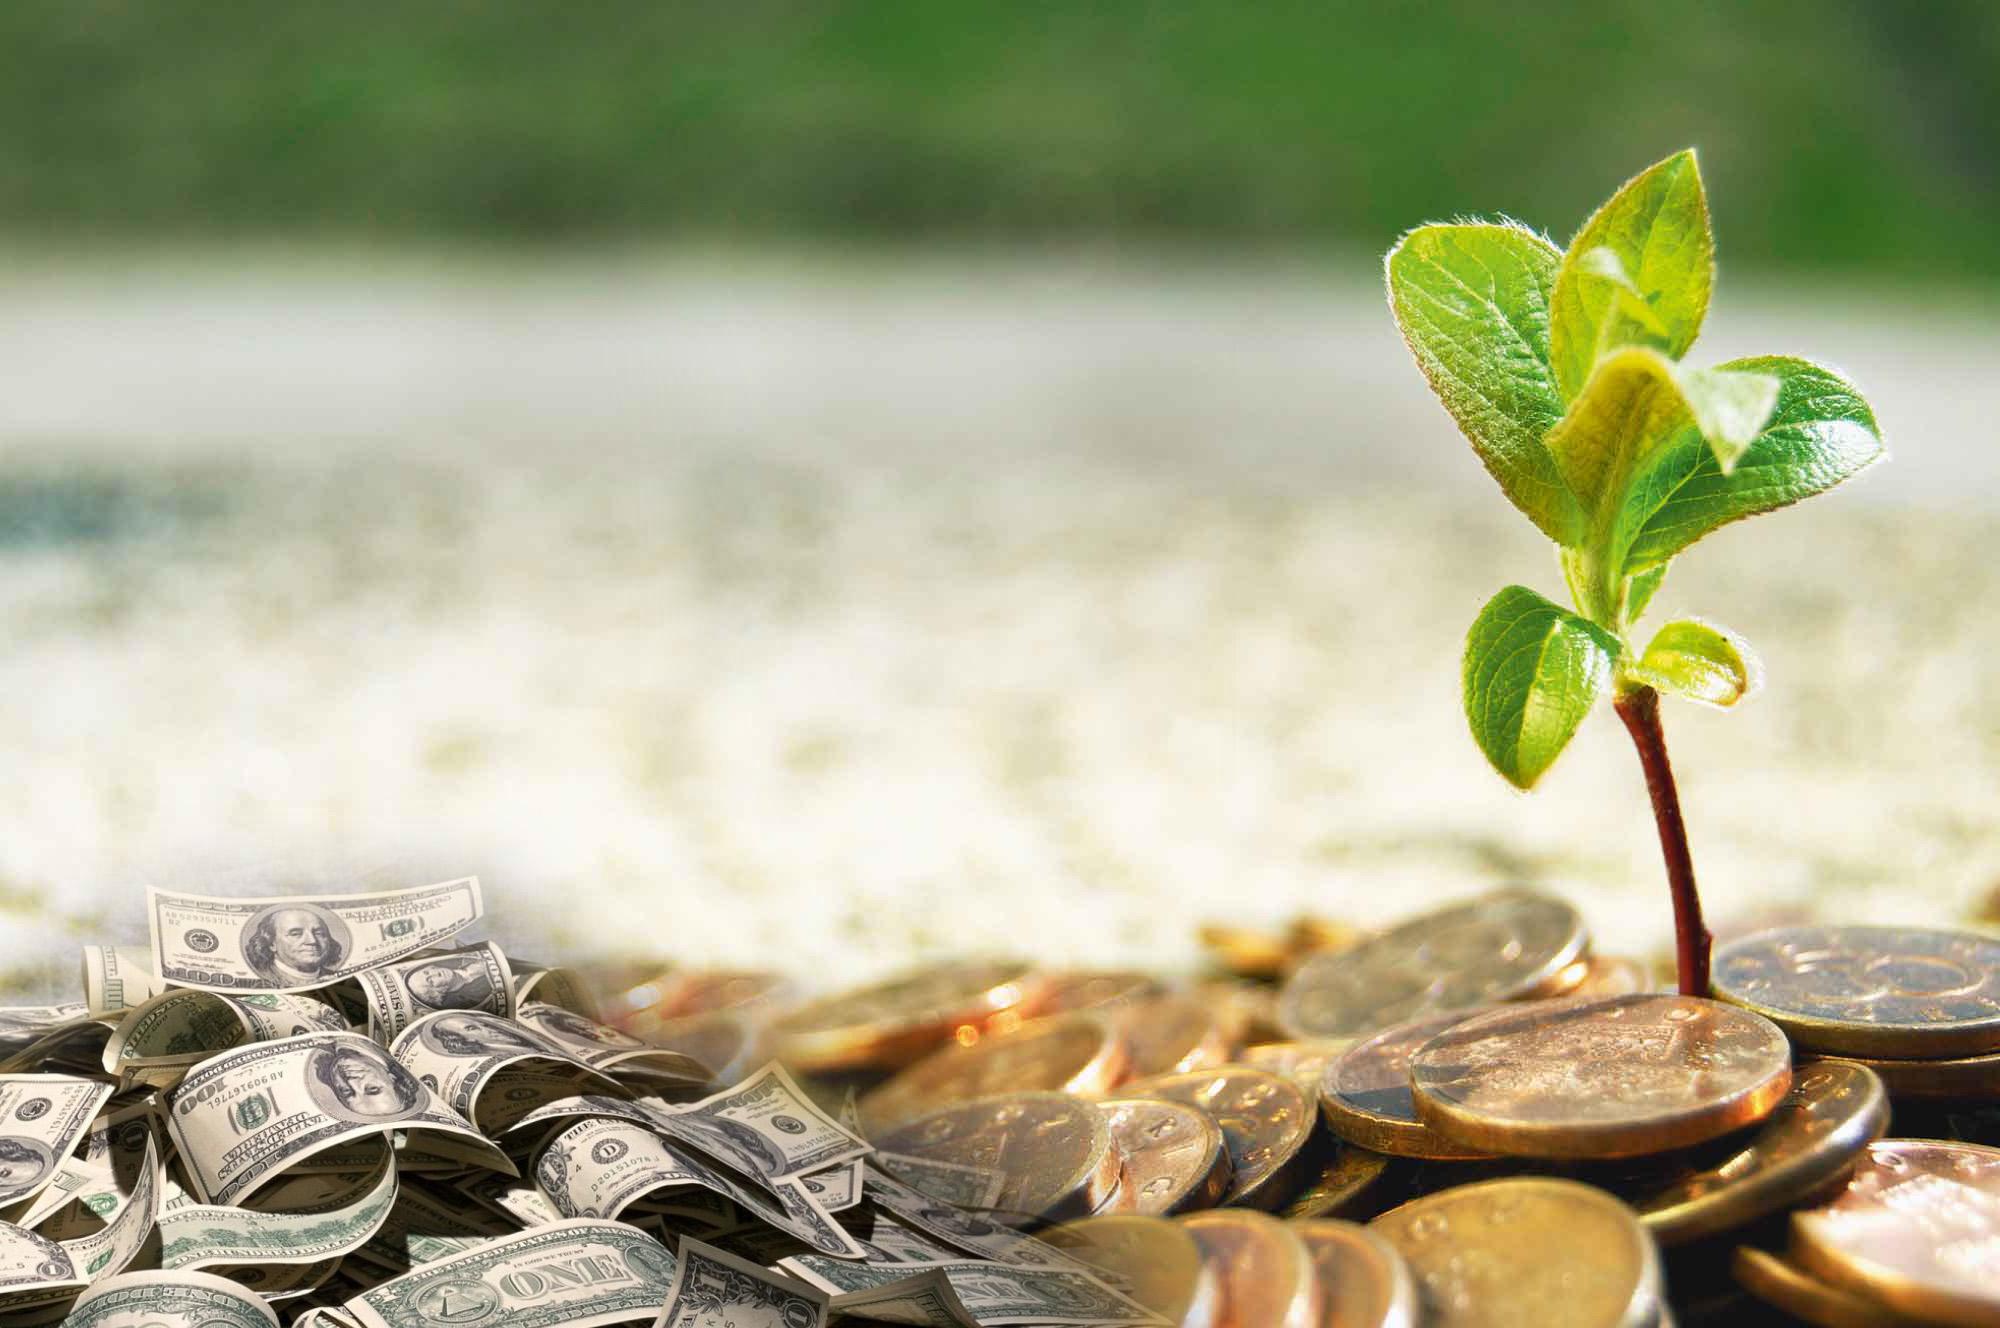 Картинки на богатство и процветание